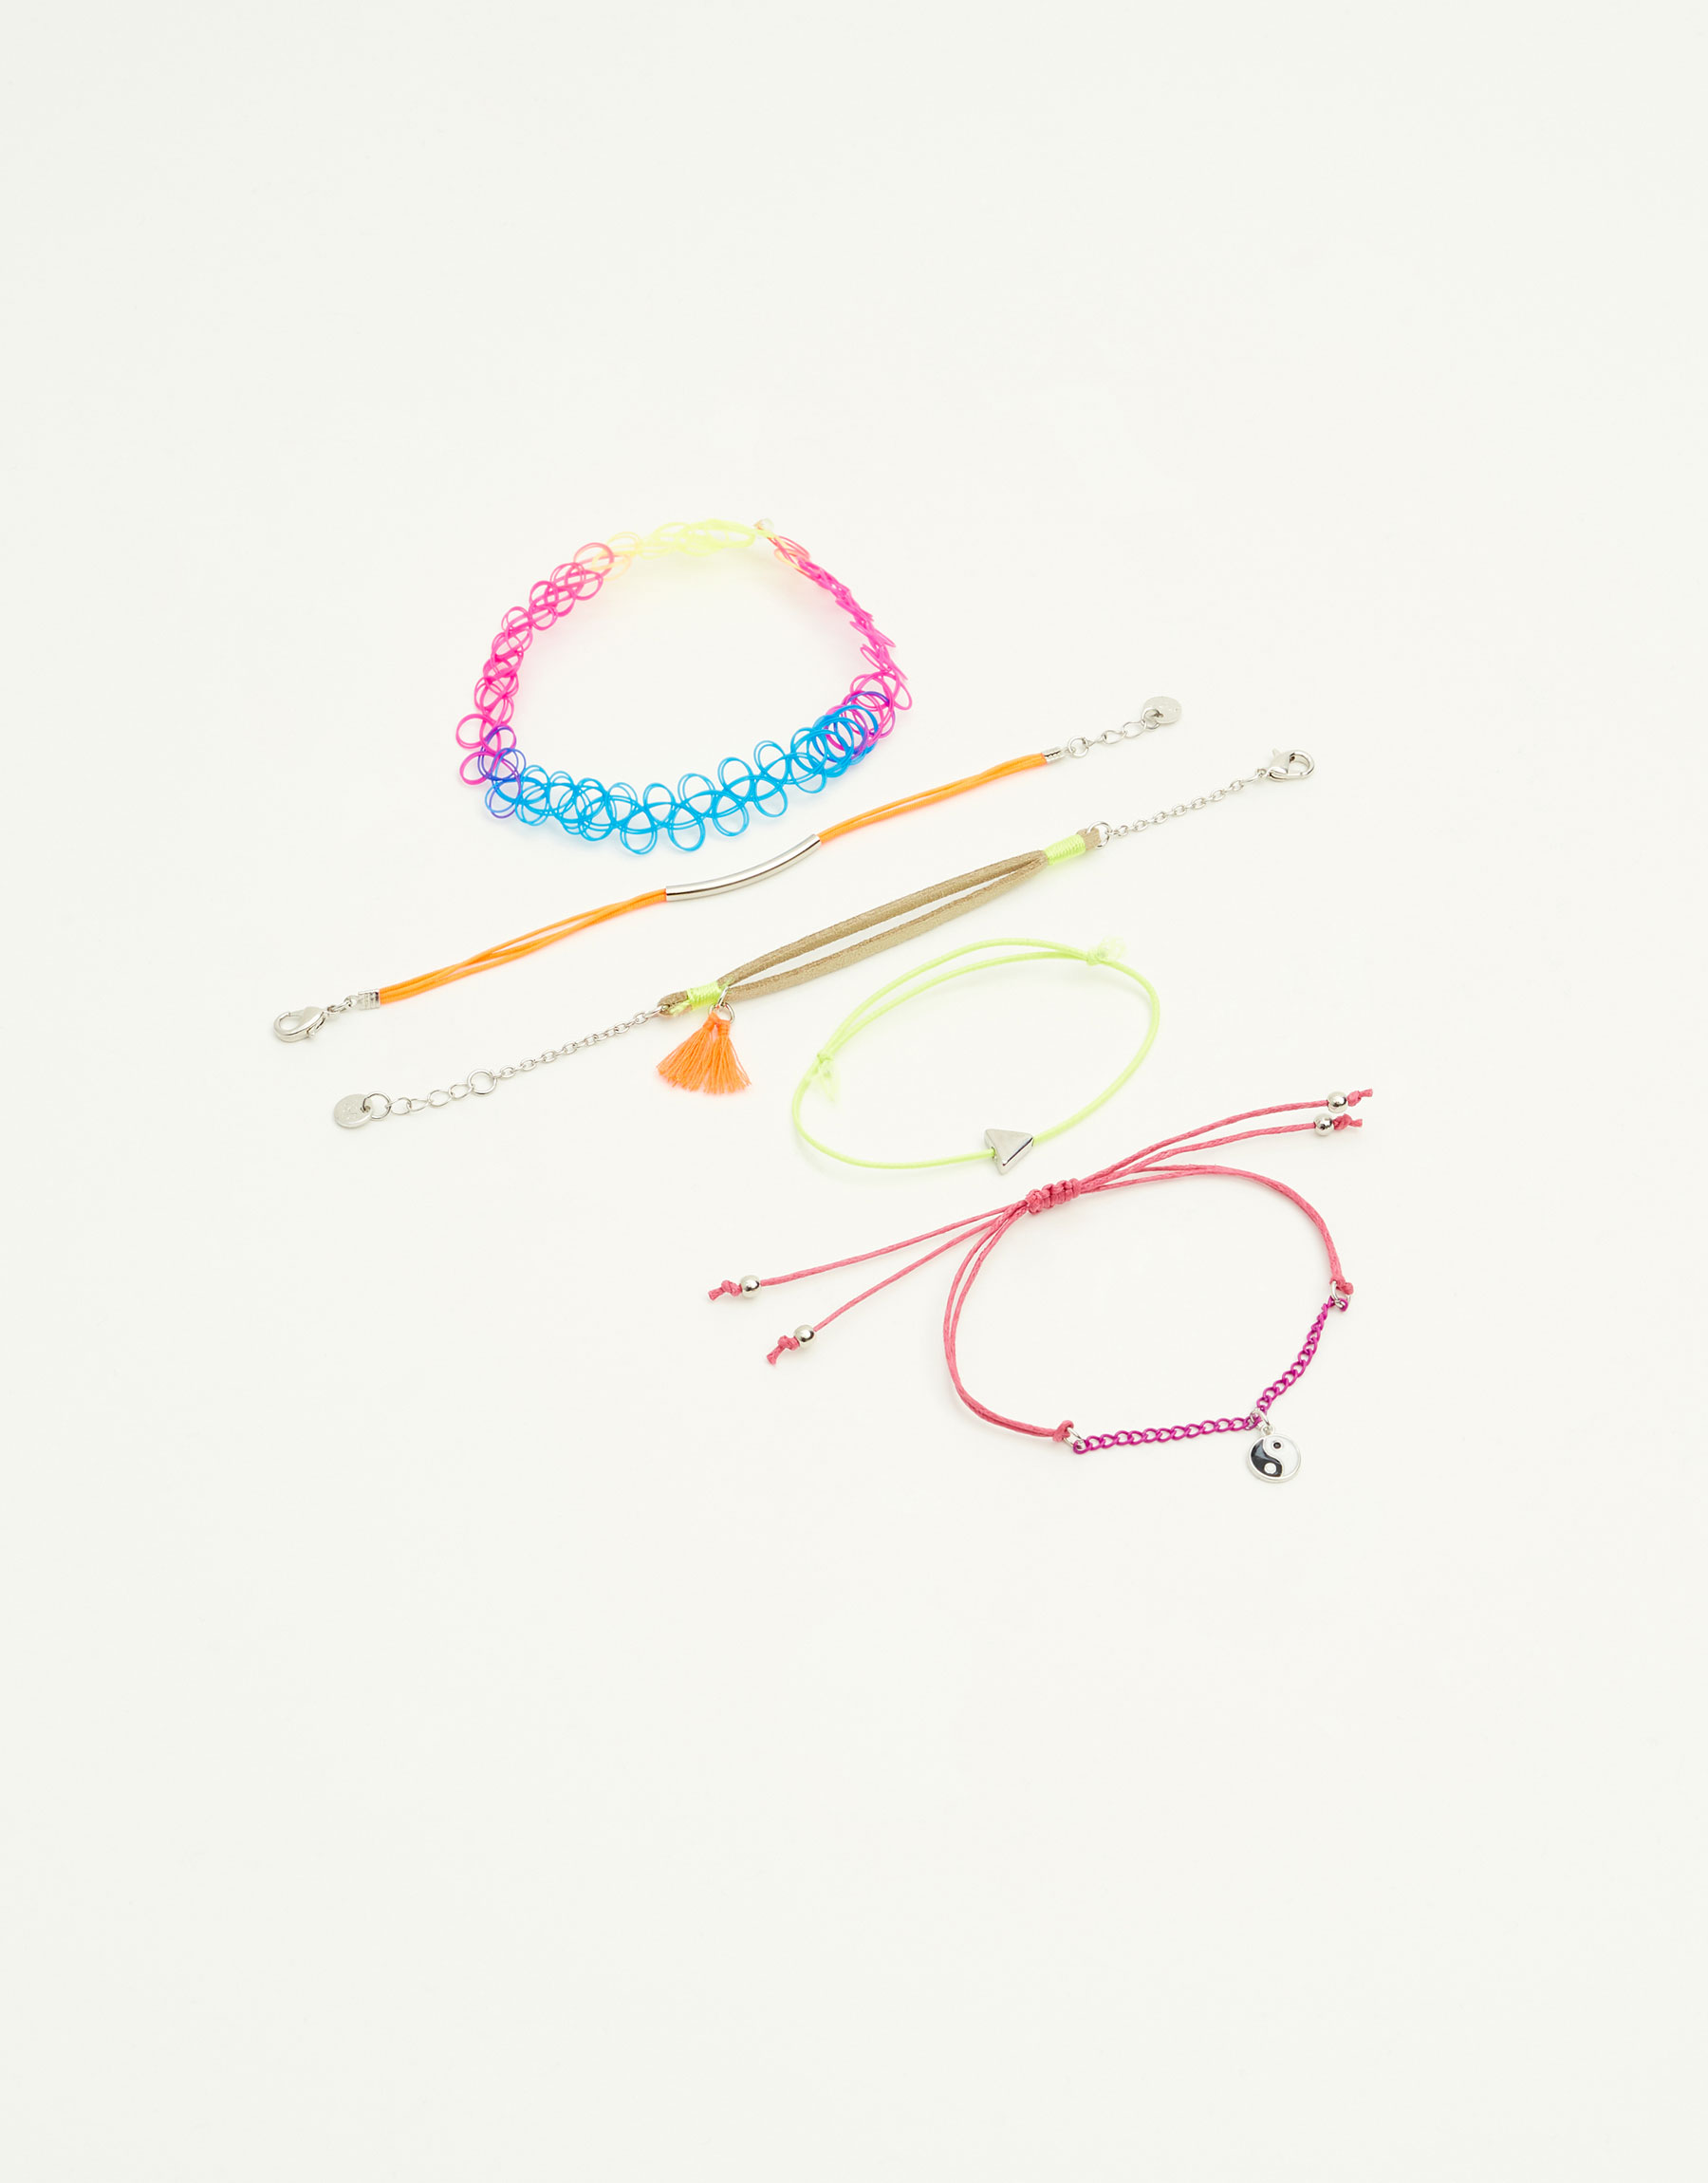 5-pack of neon bracelets